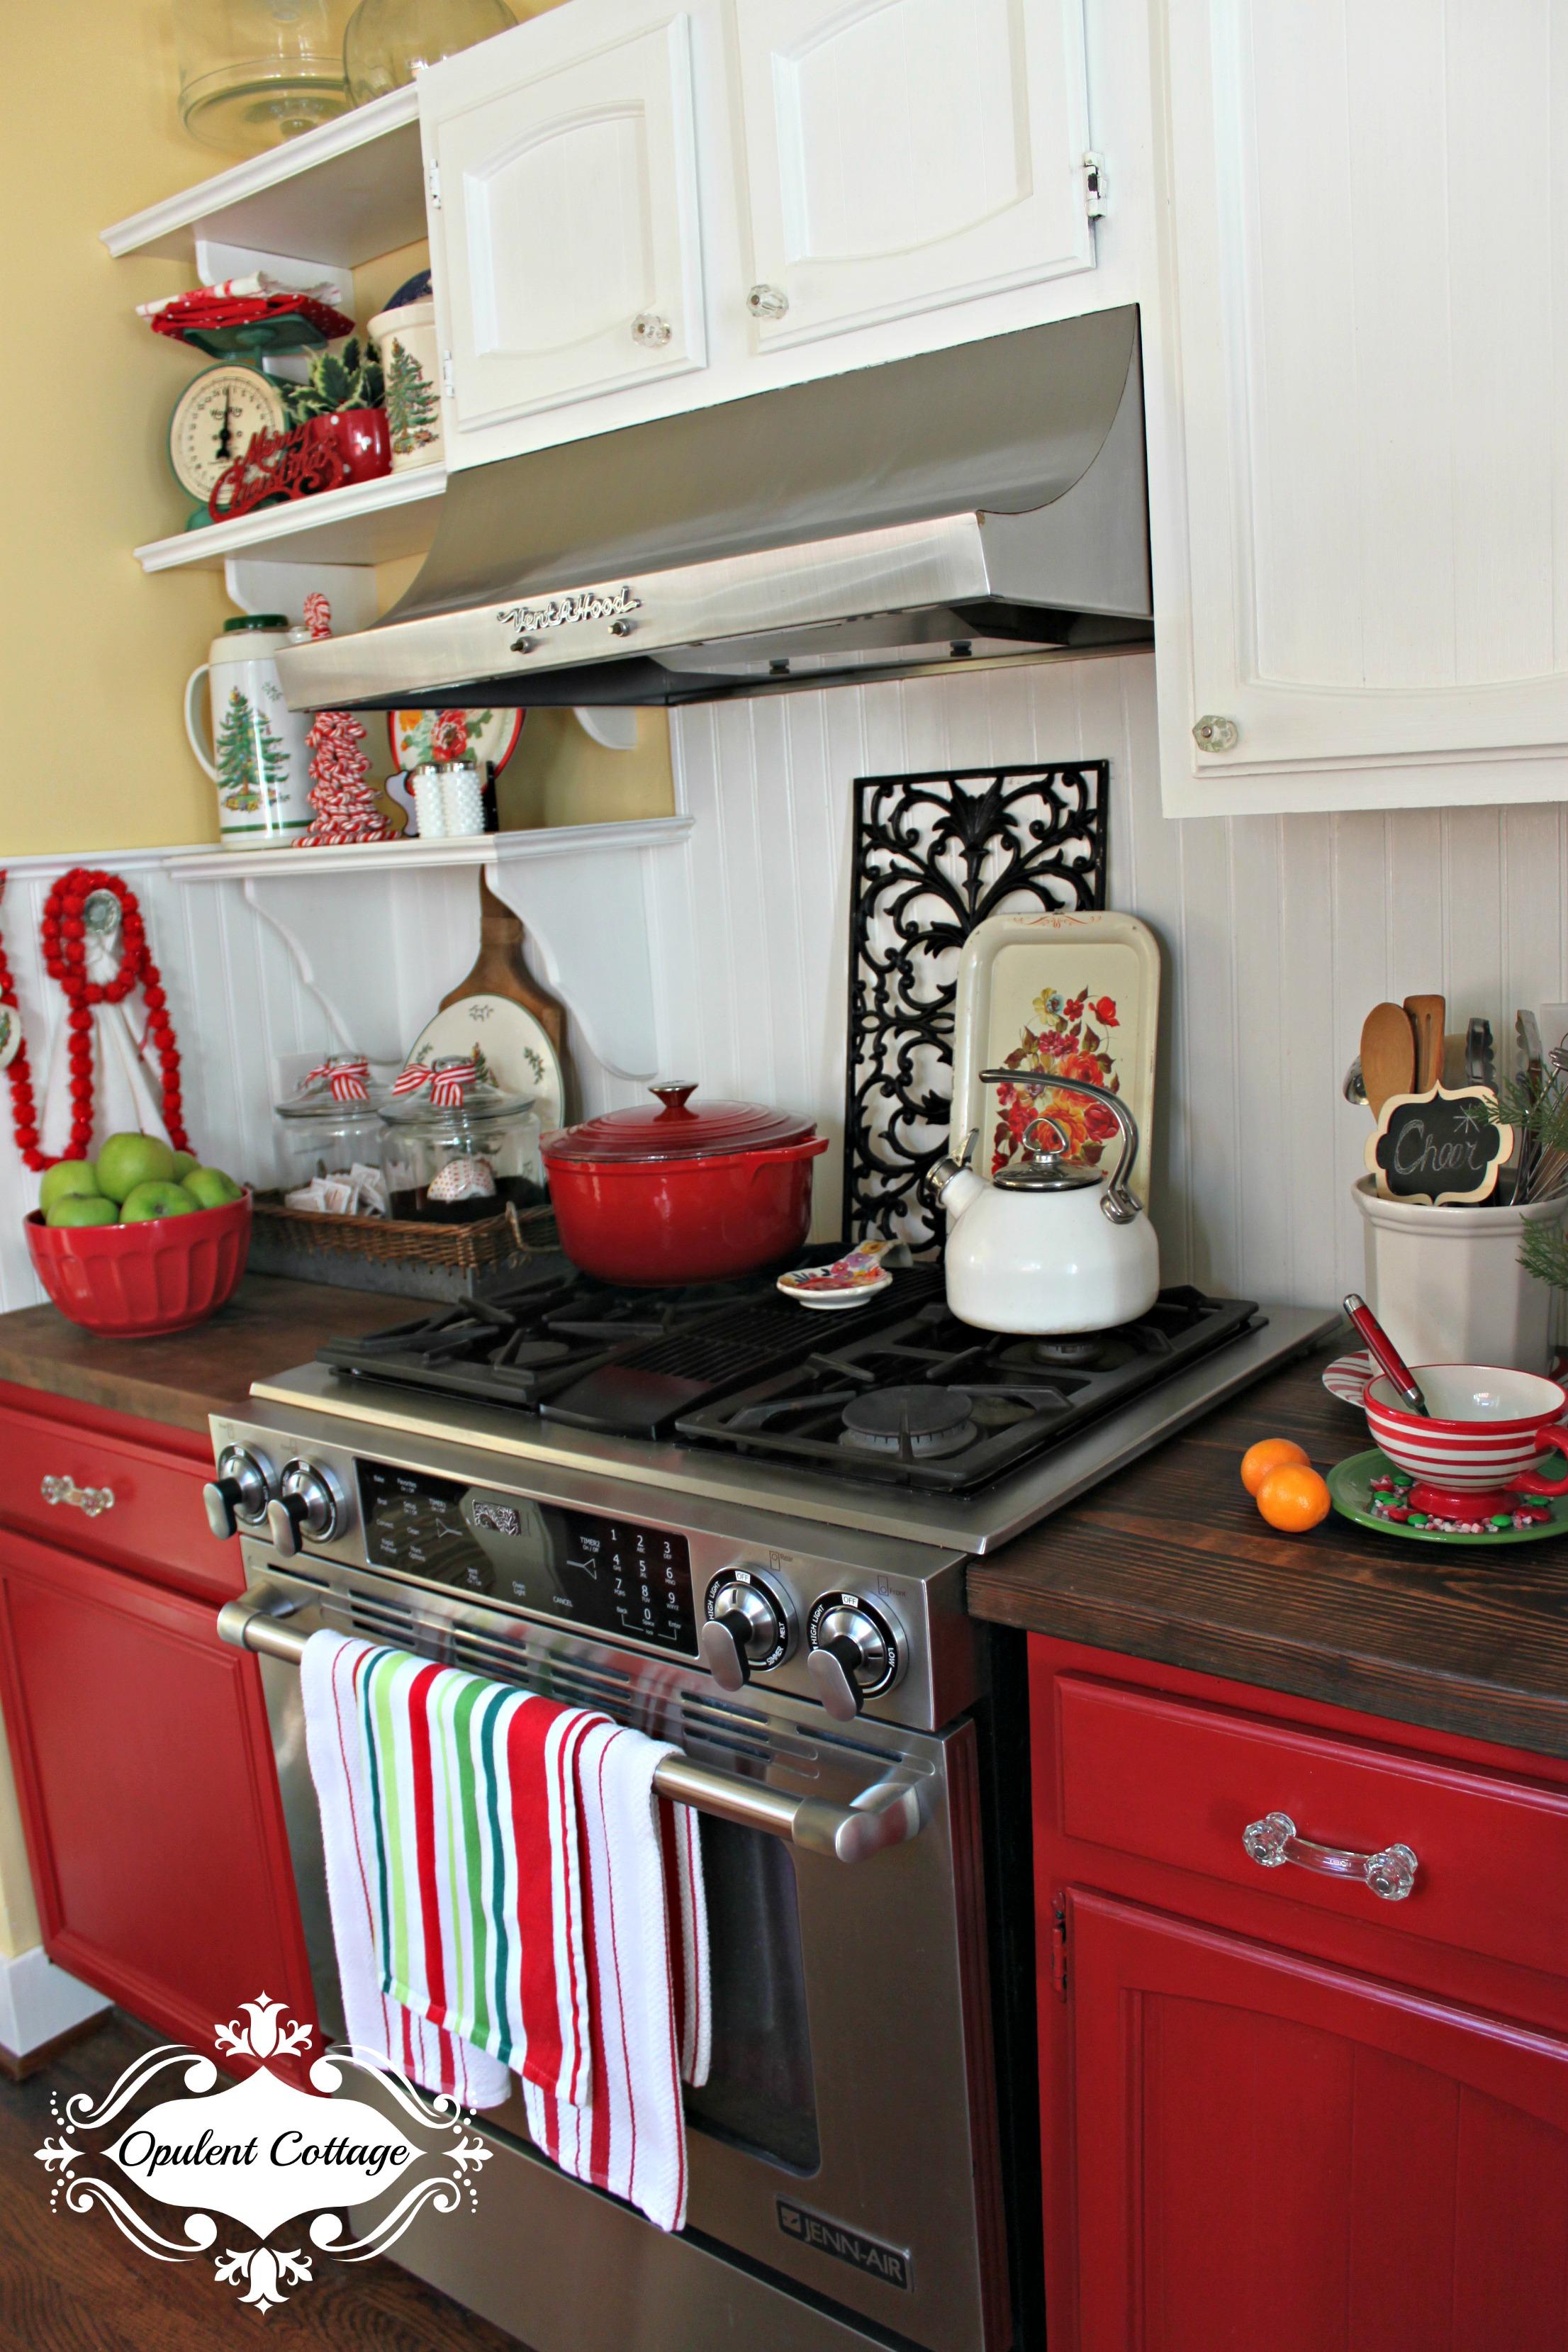 Christmas Kitchen Opulent Cottage 2015 Christmas Kitchen